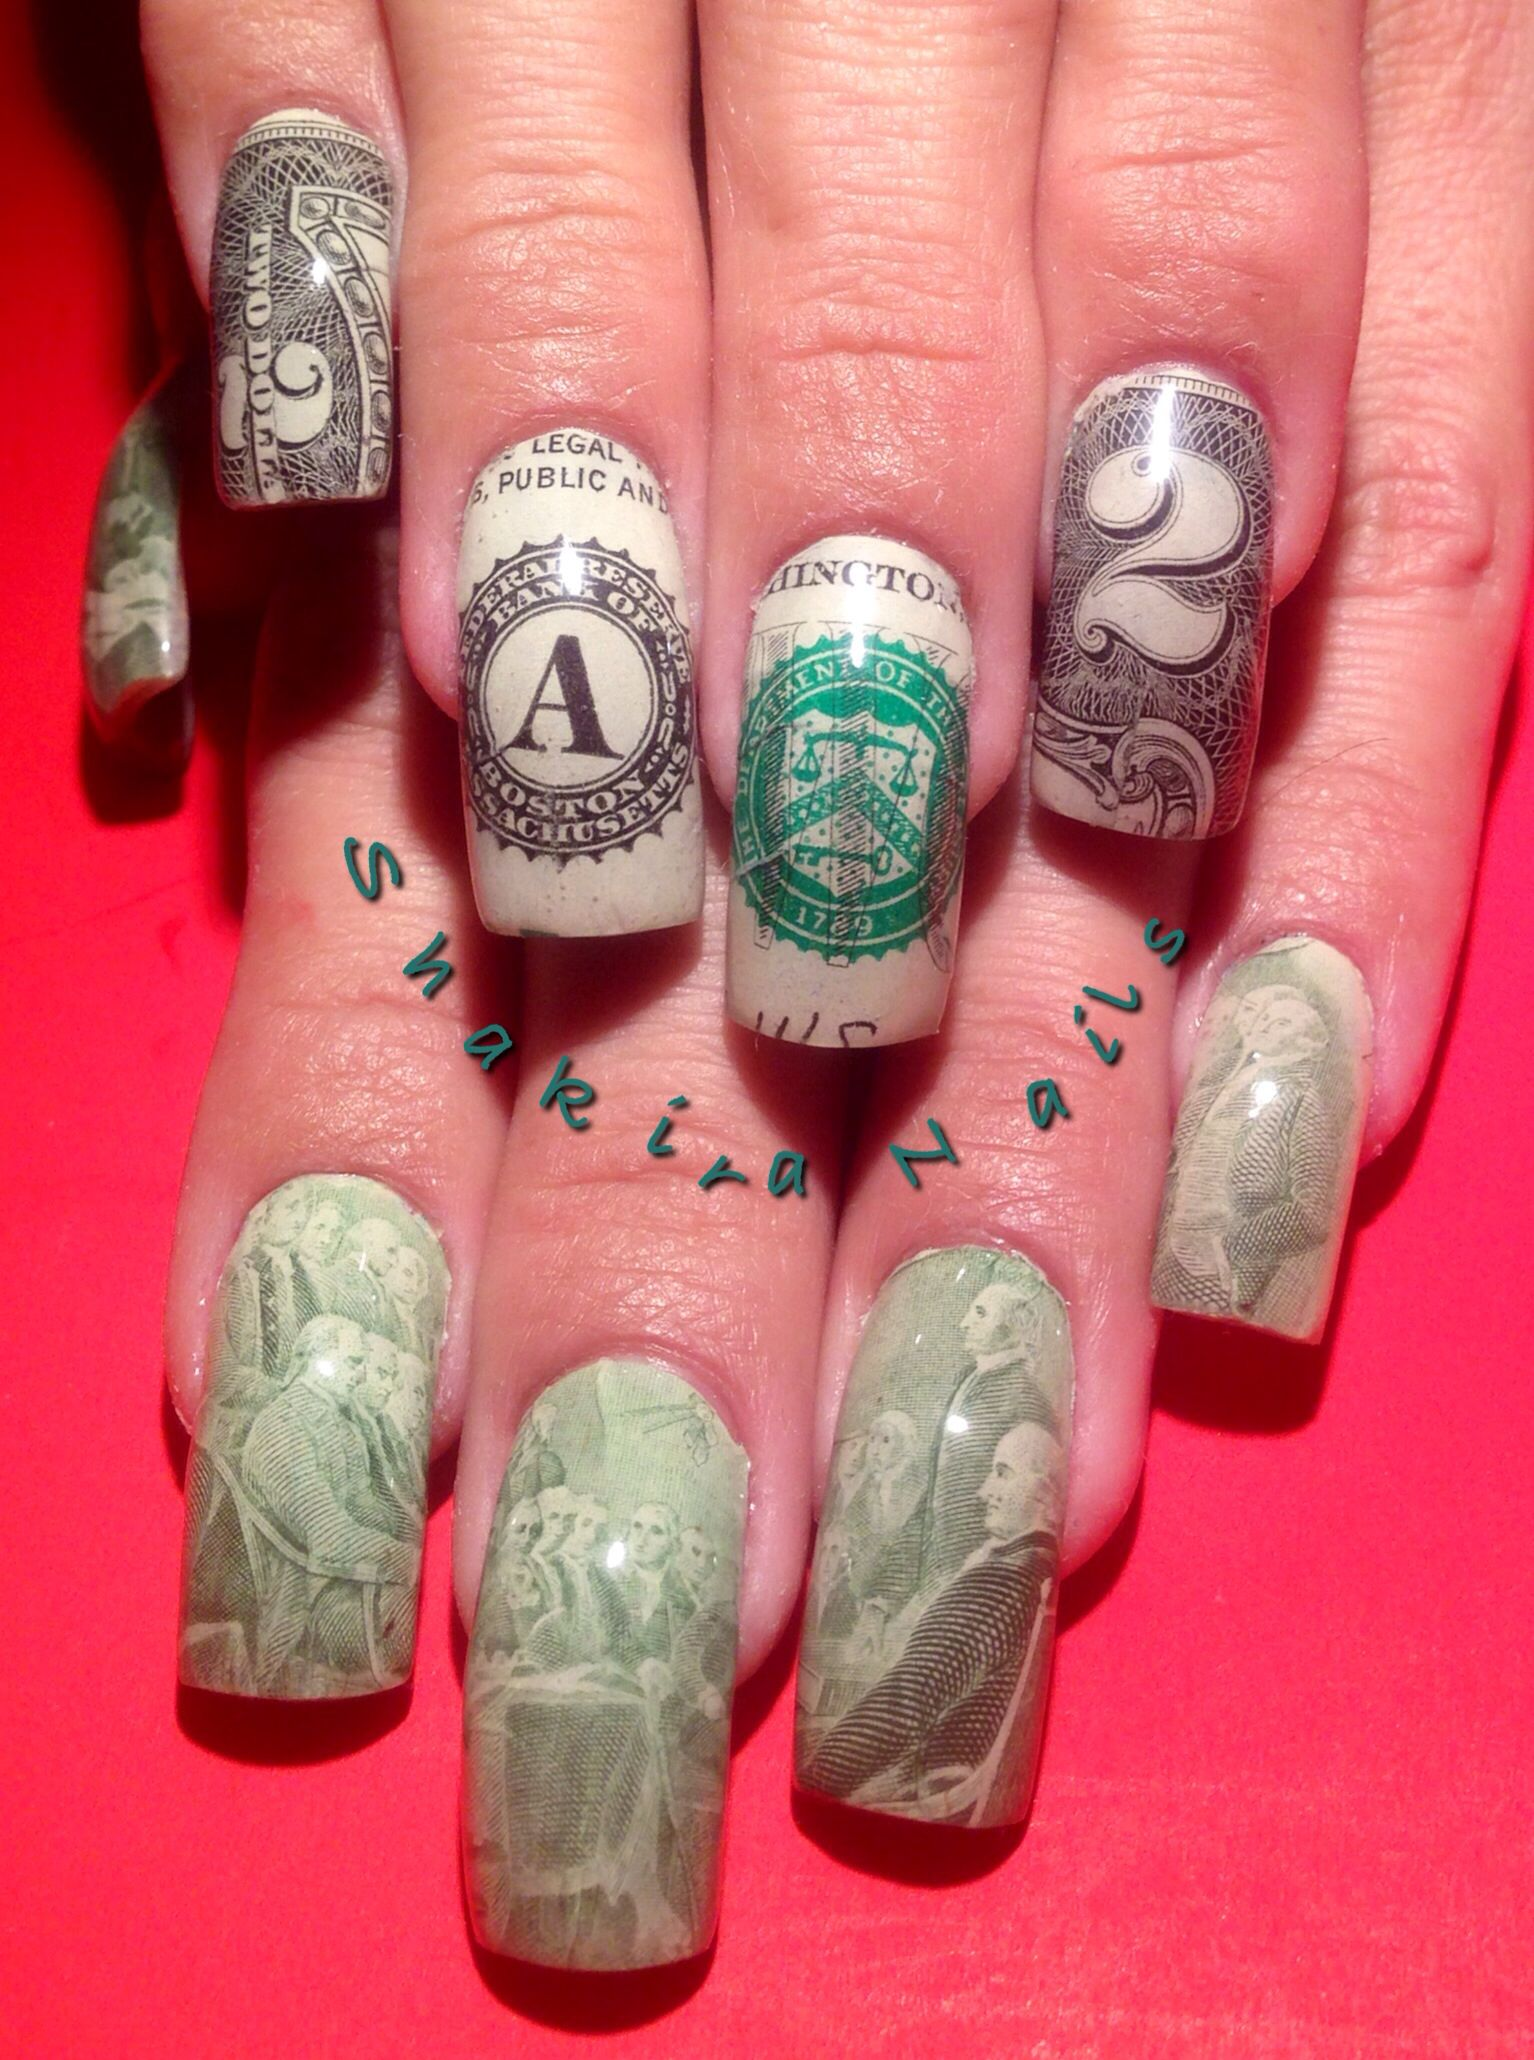 Las Vegas money nails December 2013 | Nails | Pinterest | Nagelschere